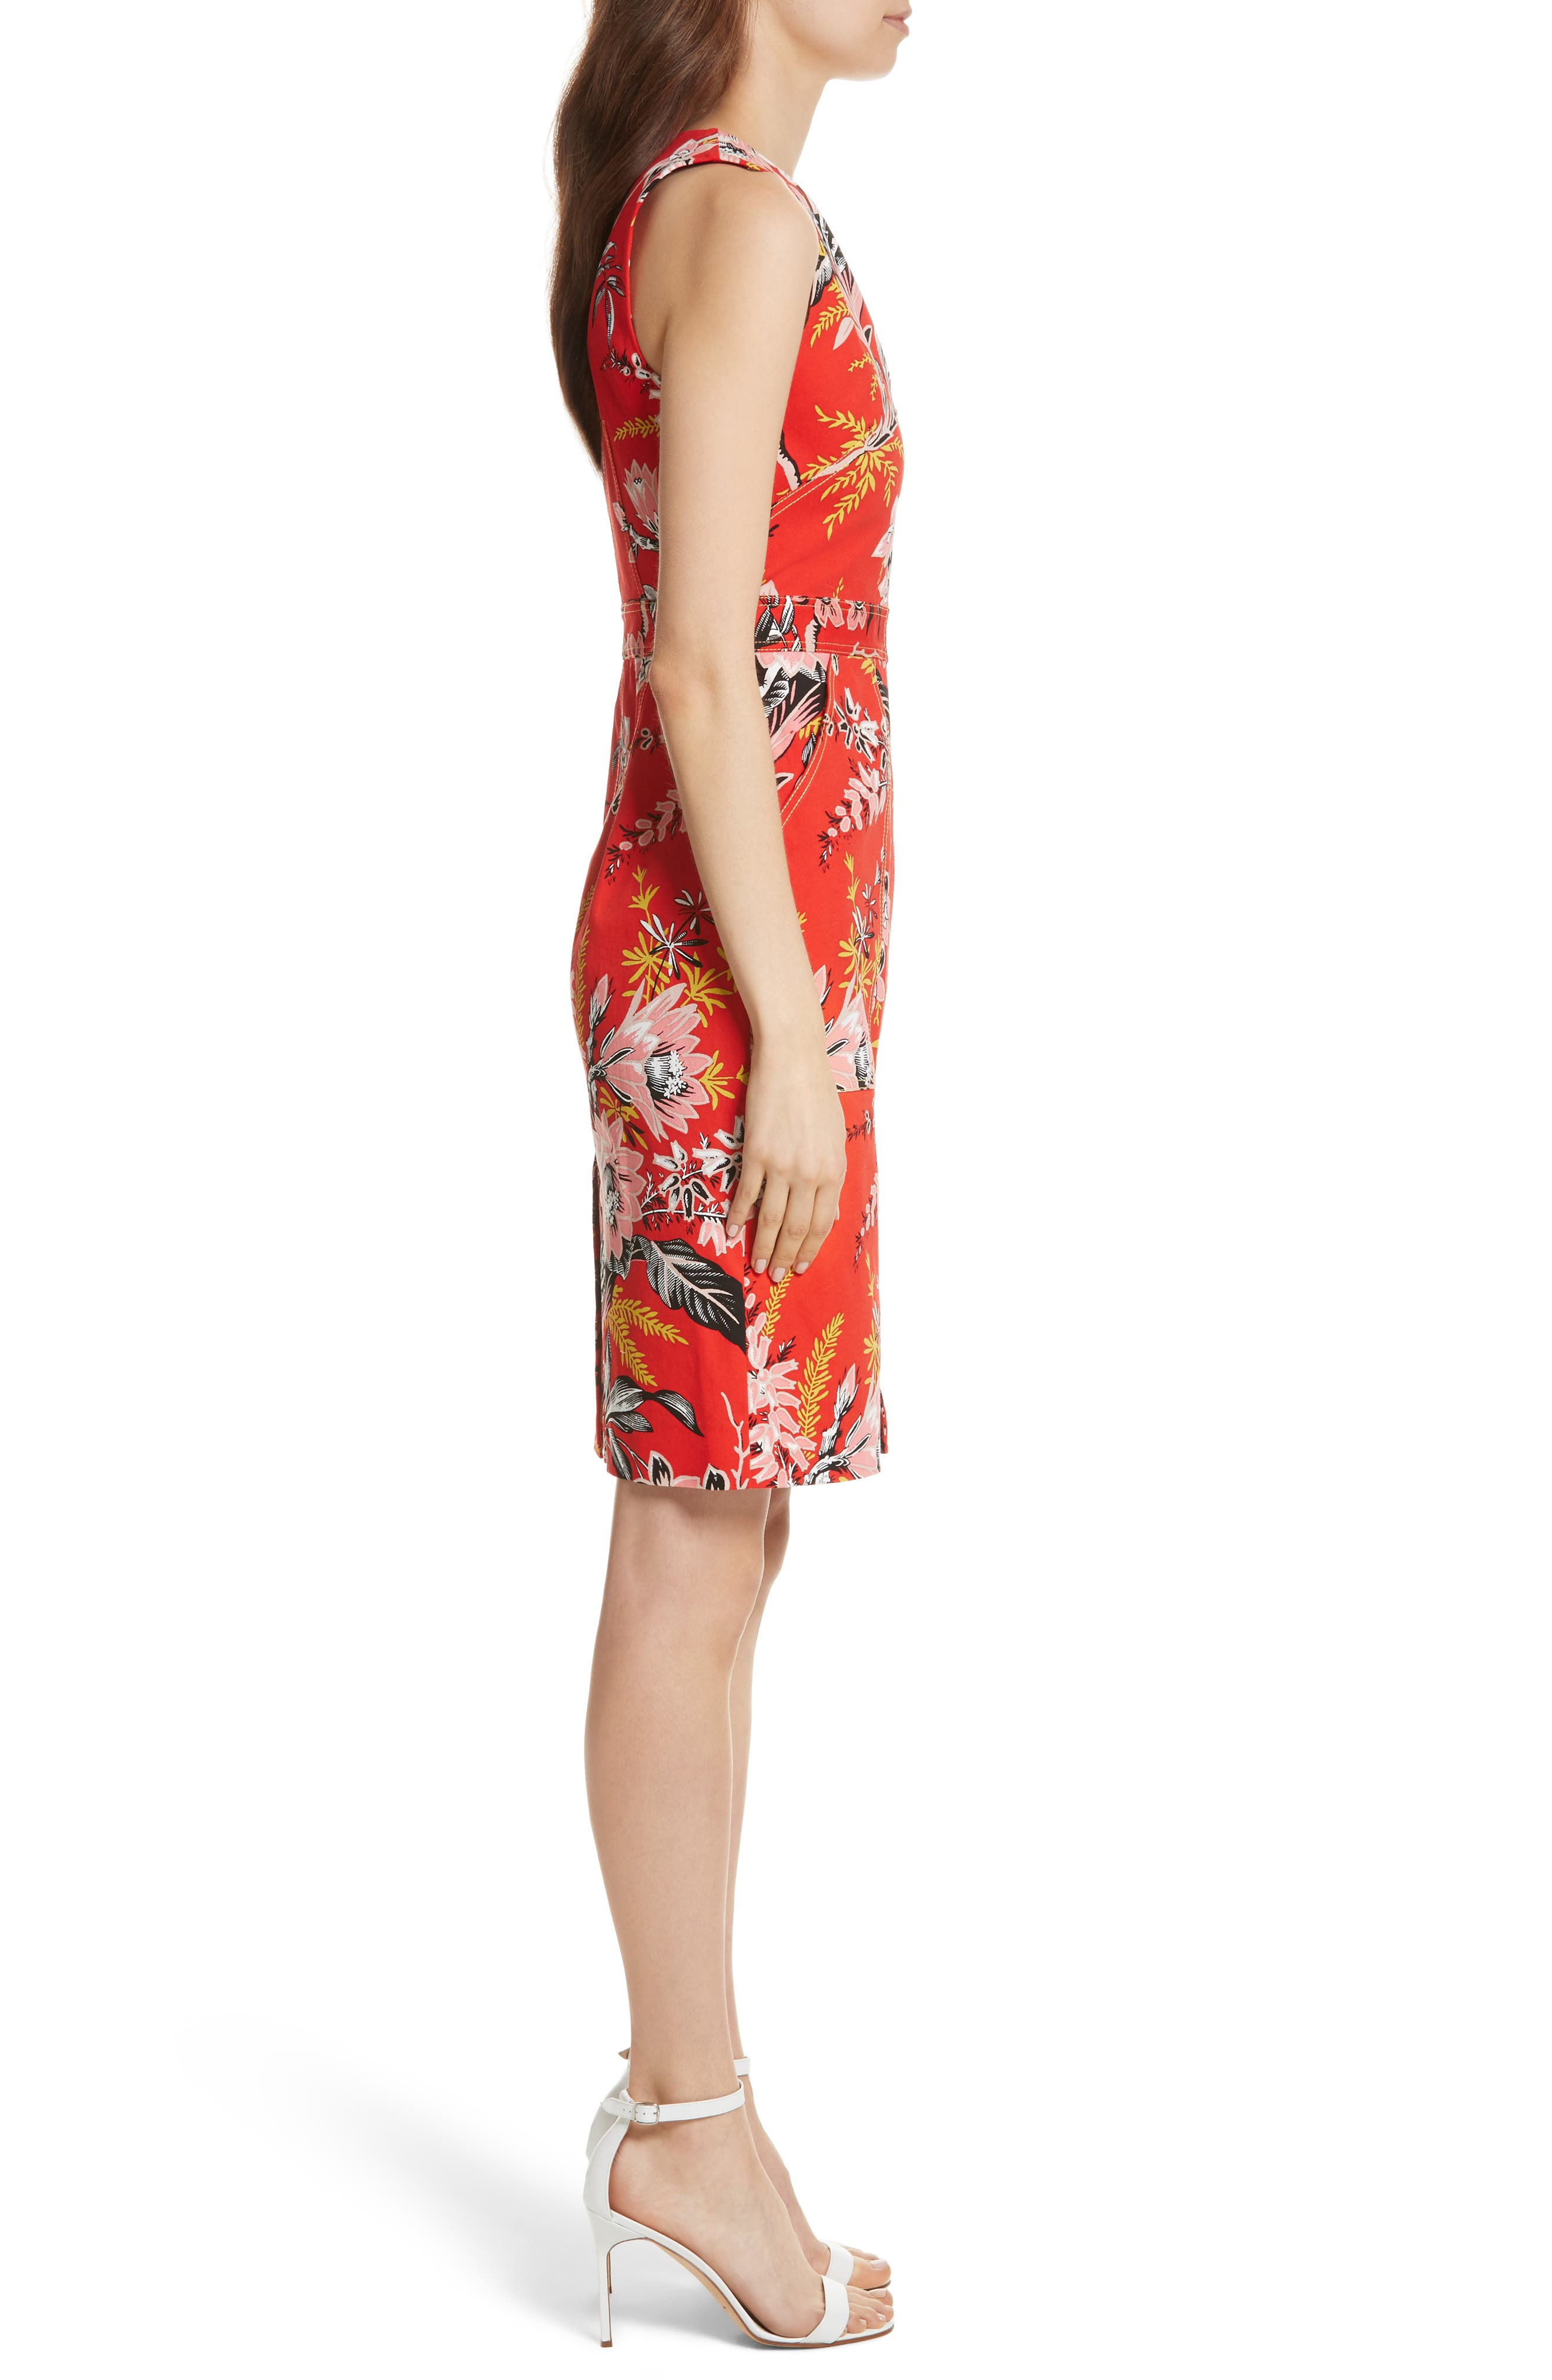 Diane von Furstenberg Floral Zip Front Stretch Cotton Sheath Dress,                             Alternate thumbnail 3, color,                             603